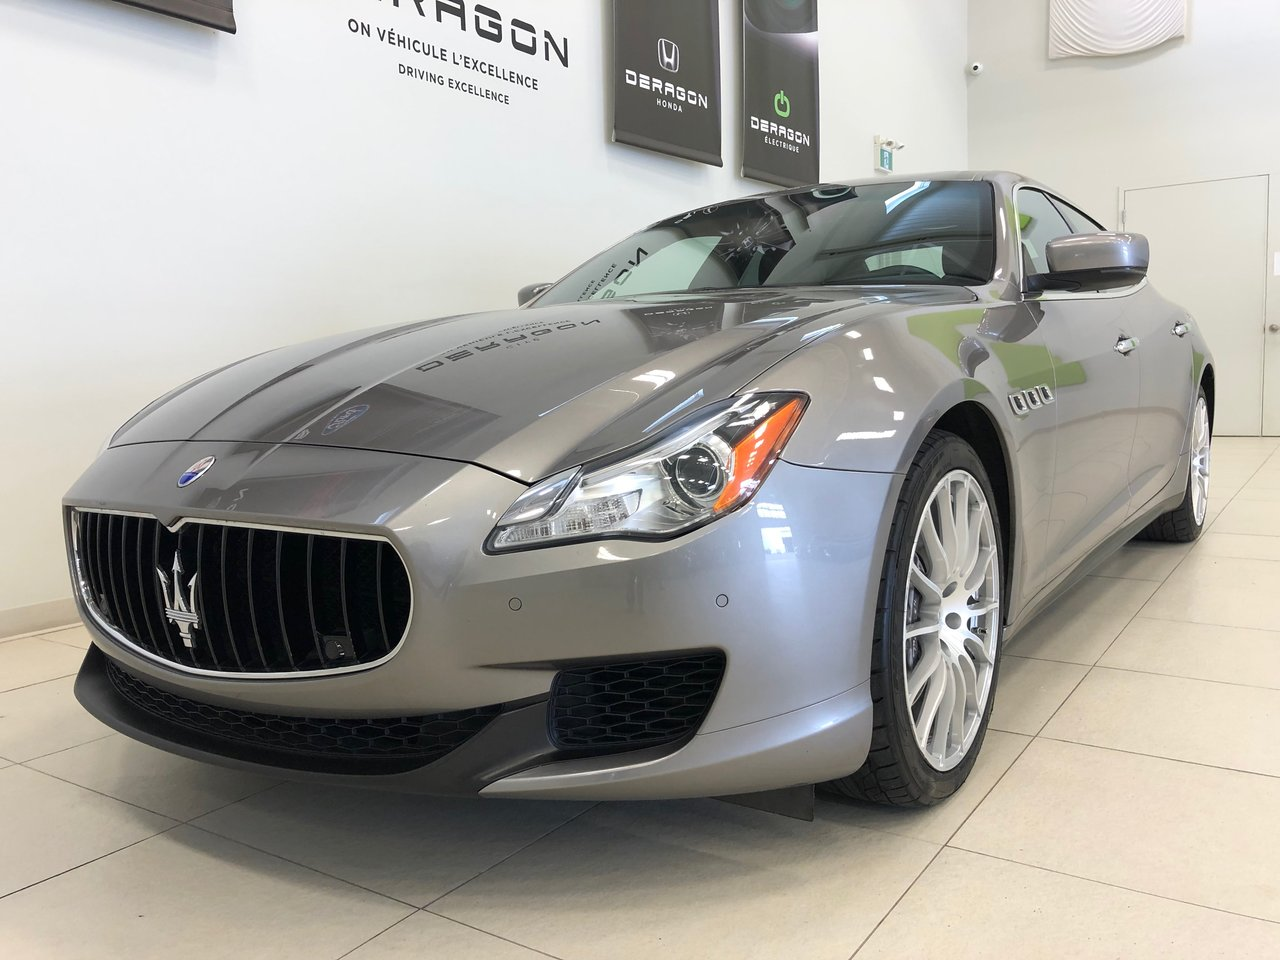 Maserati Quattroporte 2015 S Q4, 410HP, NAV, CAMÉRA, PARKING ASSIST